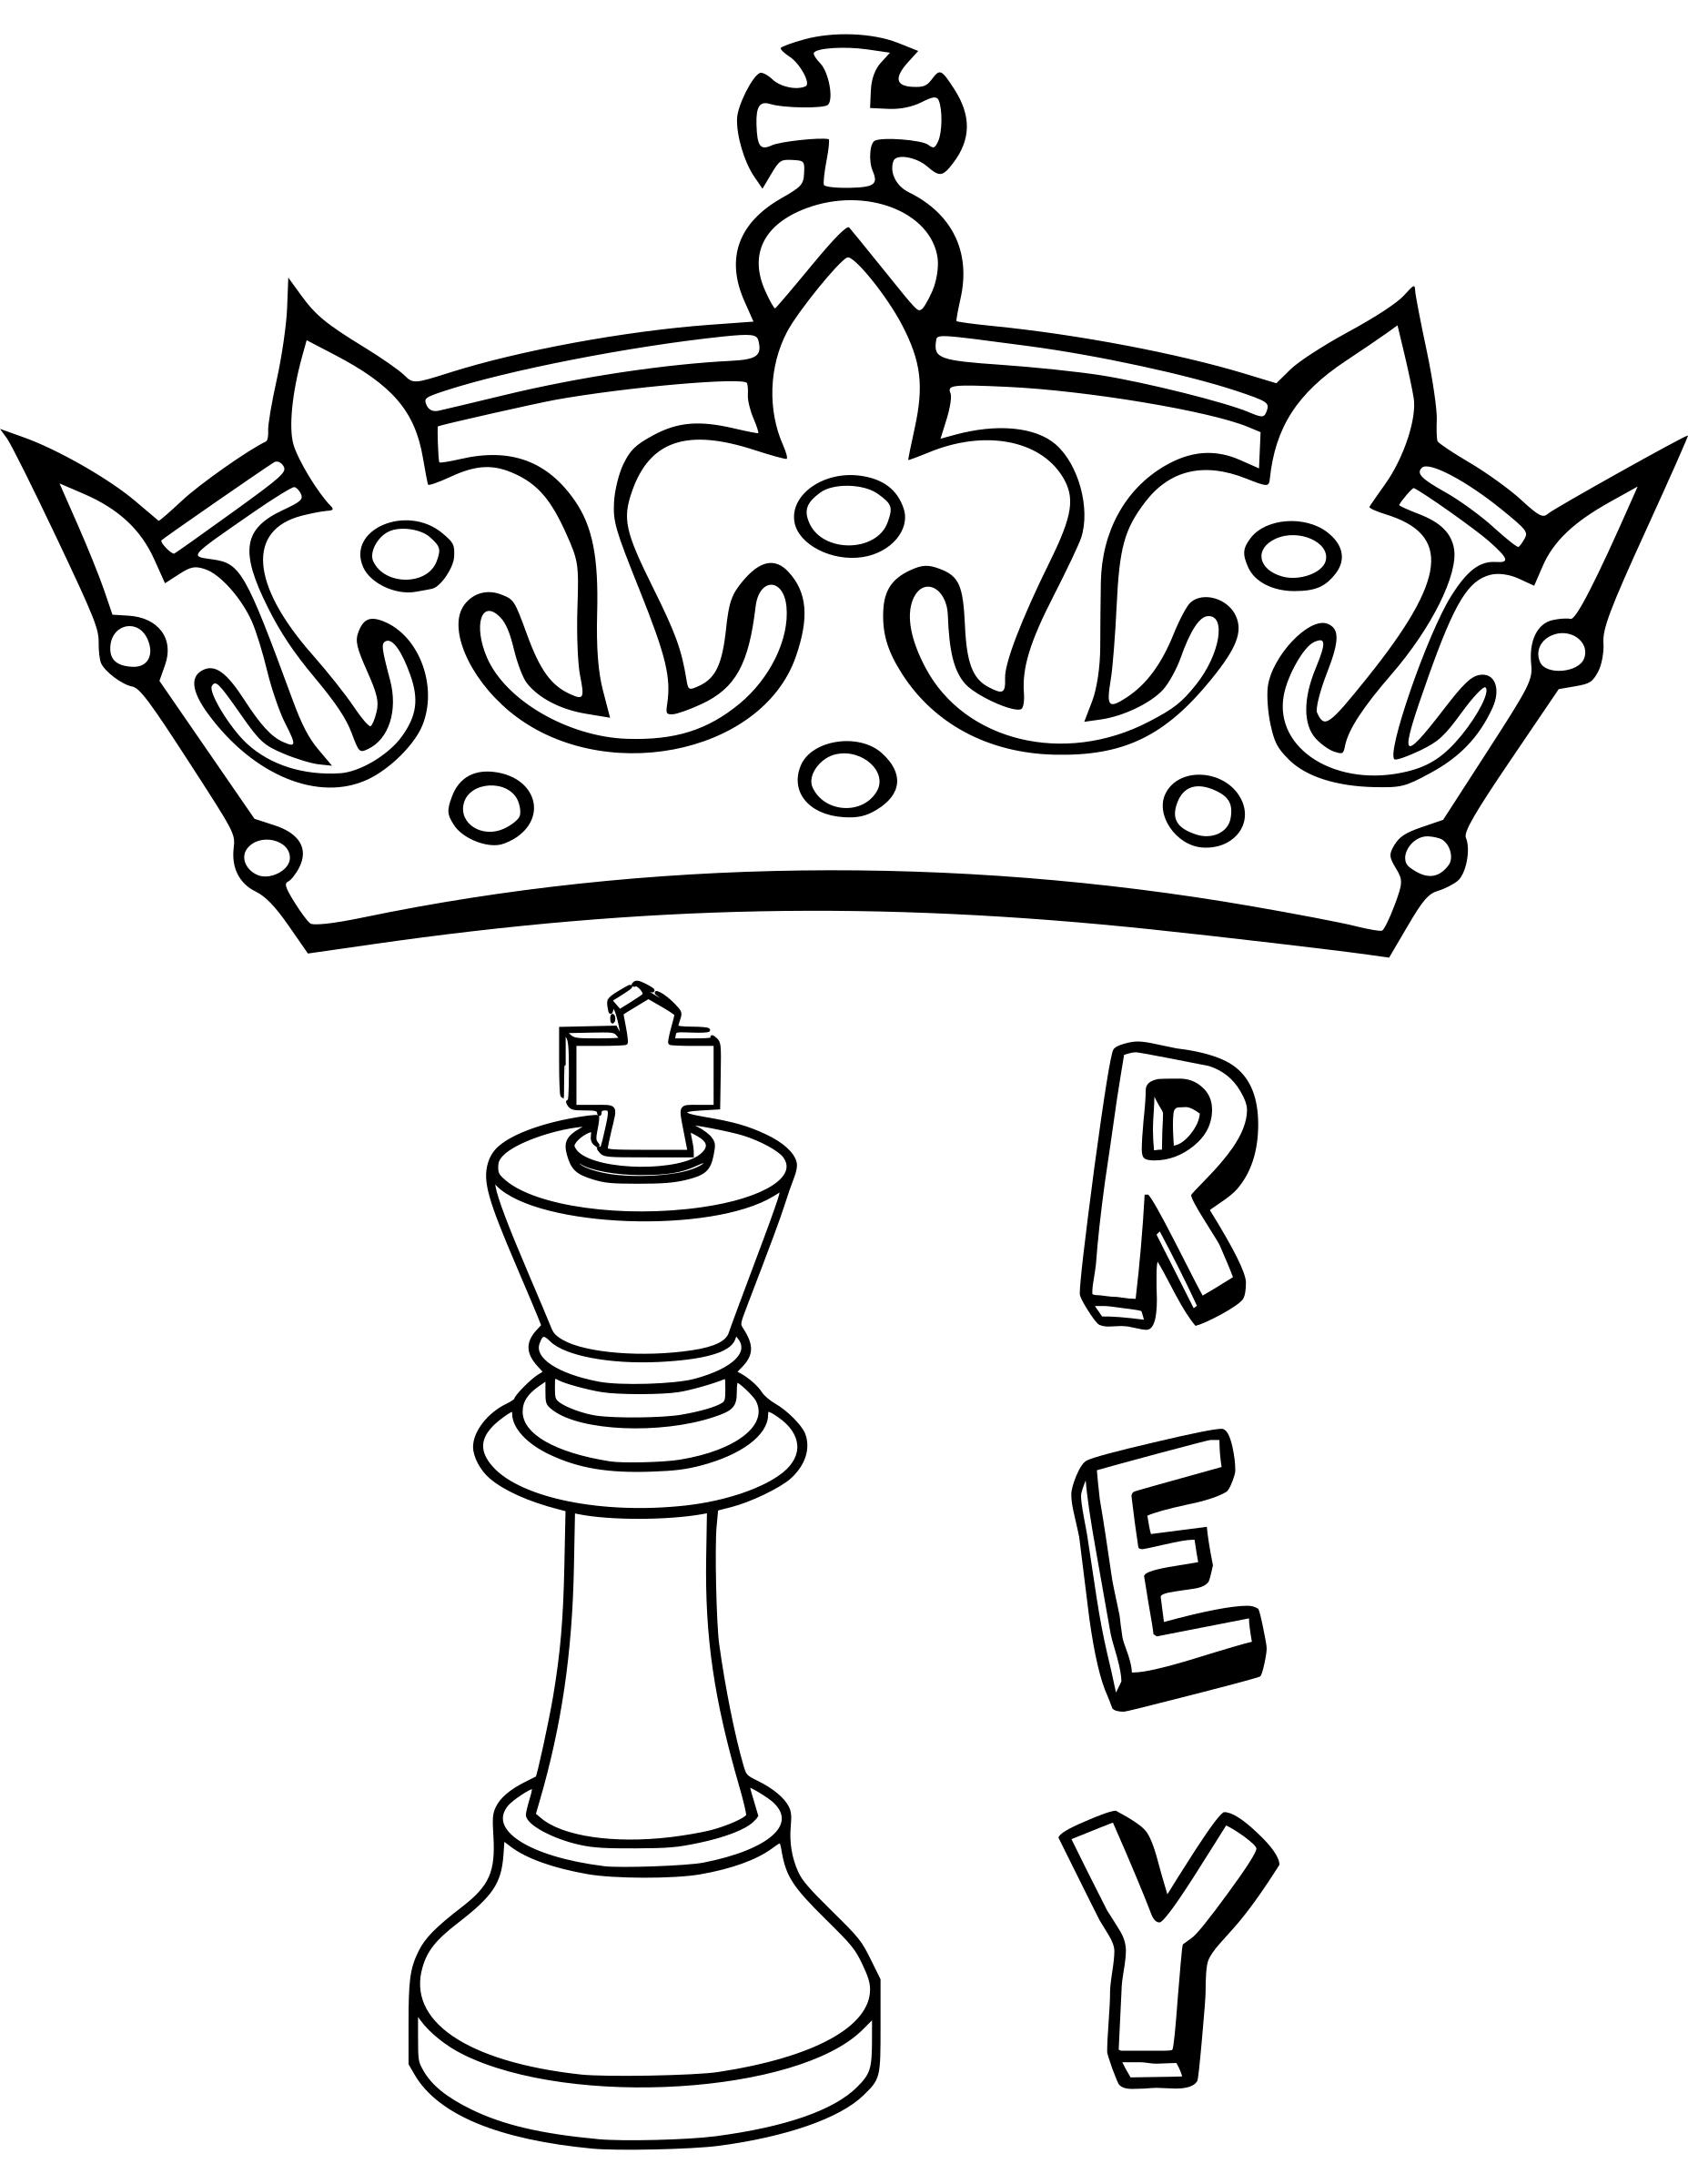 Clipart - Chess coloring book / Dibujo Ajedrez para colorear -3-